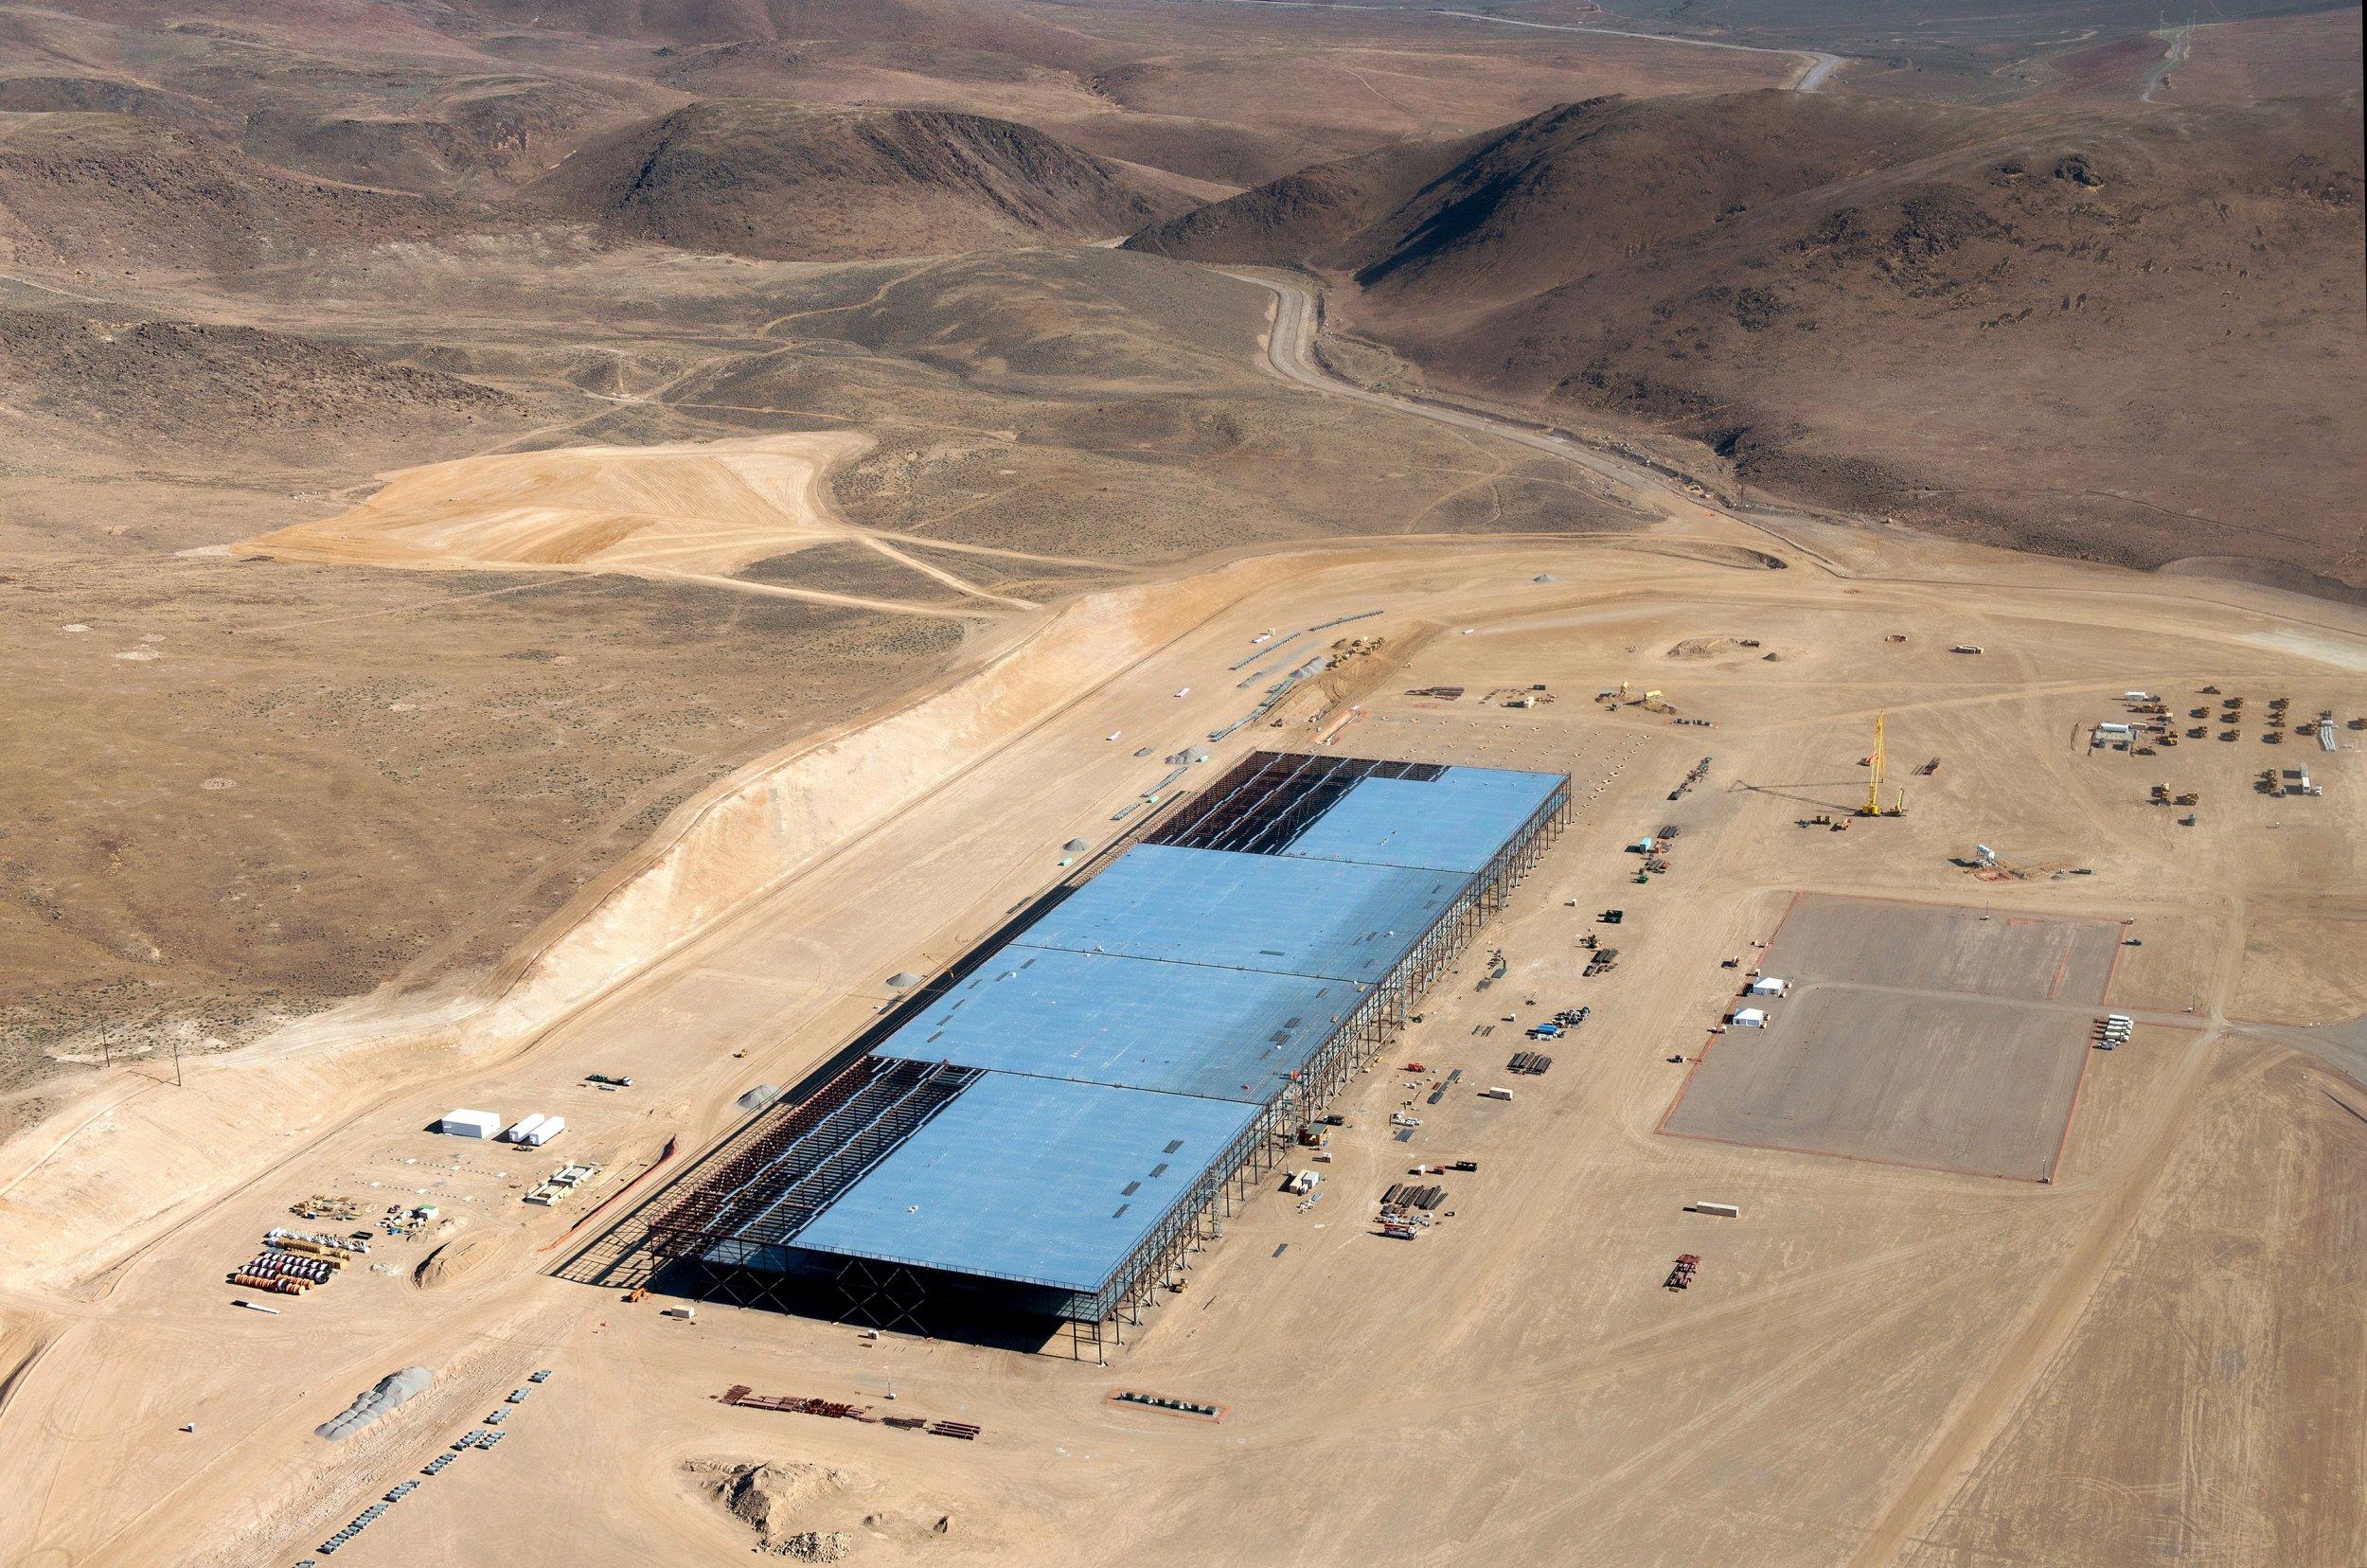 Tesla Gigafactory Jobs >> Tesla Says Threat To Shoot Up Gigafactory Came From Friend Of